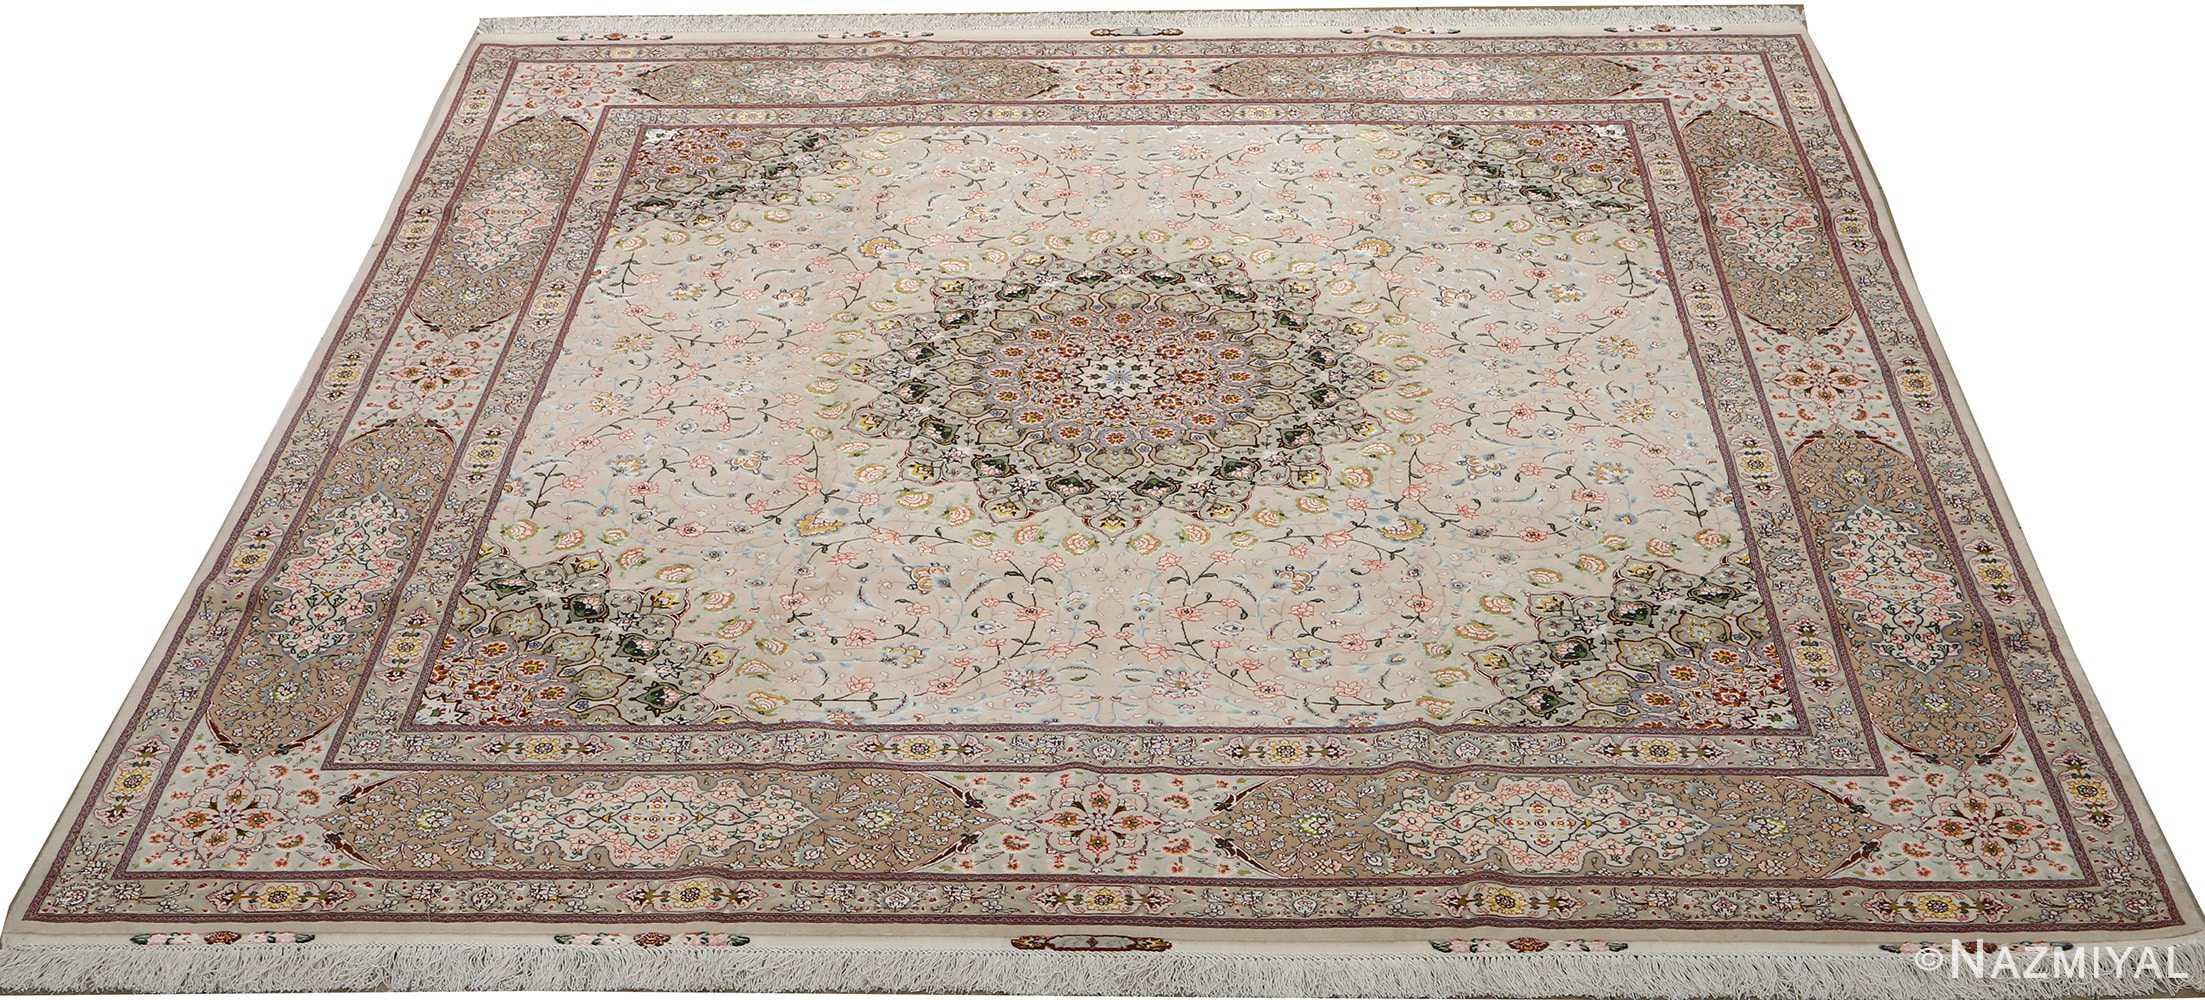 square shahsavarpour design vintage tabriz persian rug 51076 full Nazmiyal